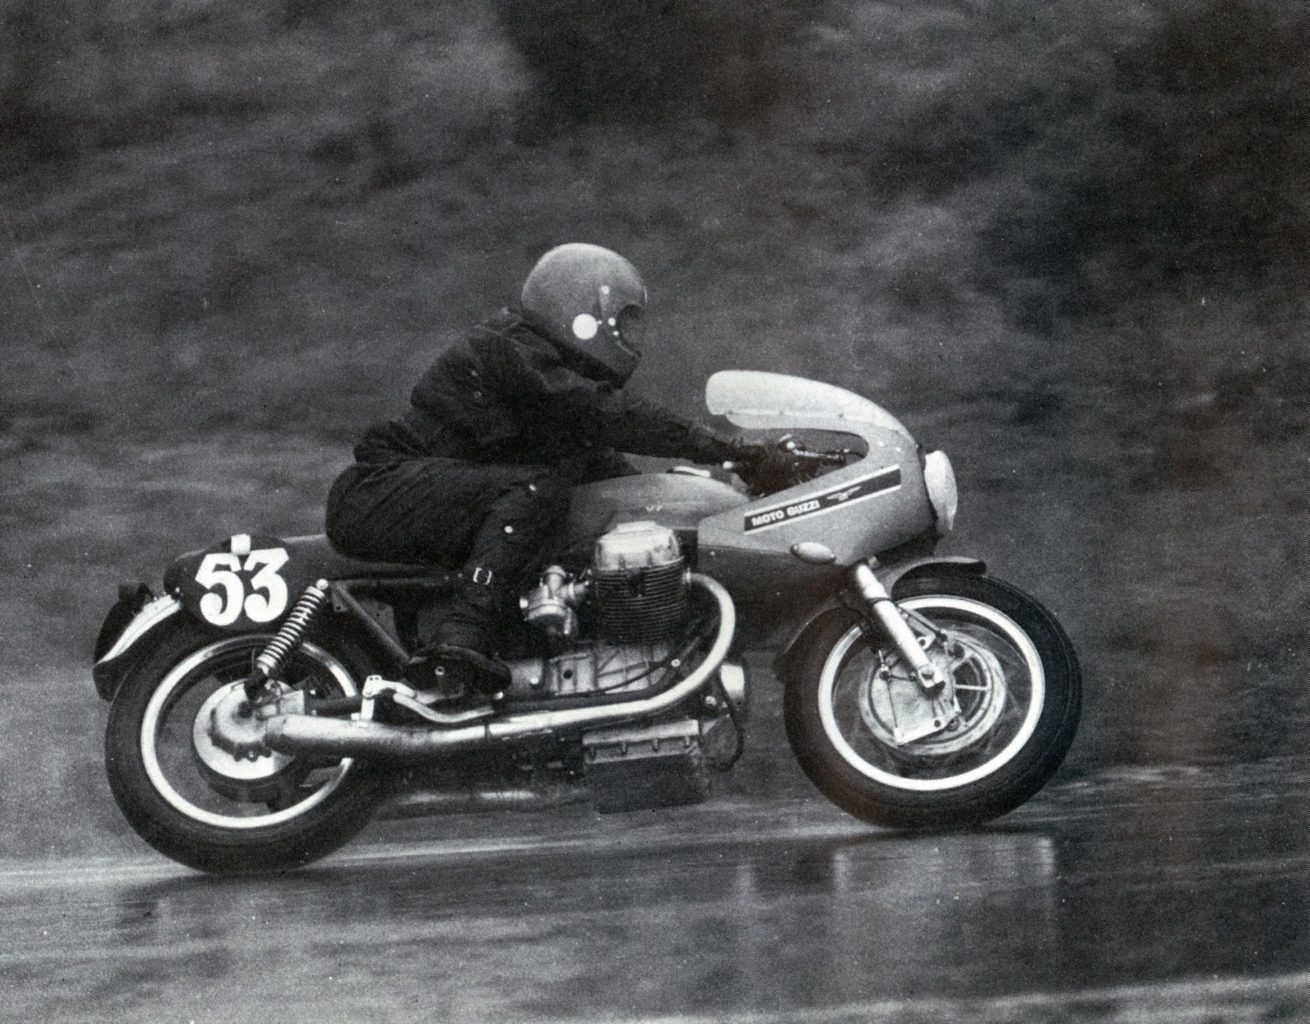 MotoGuzzi 1971 Bol d'Or